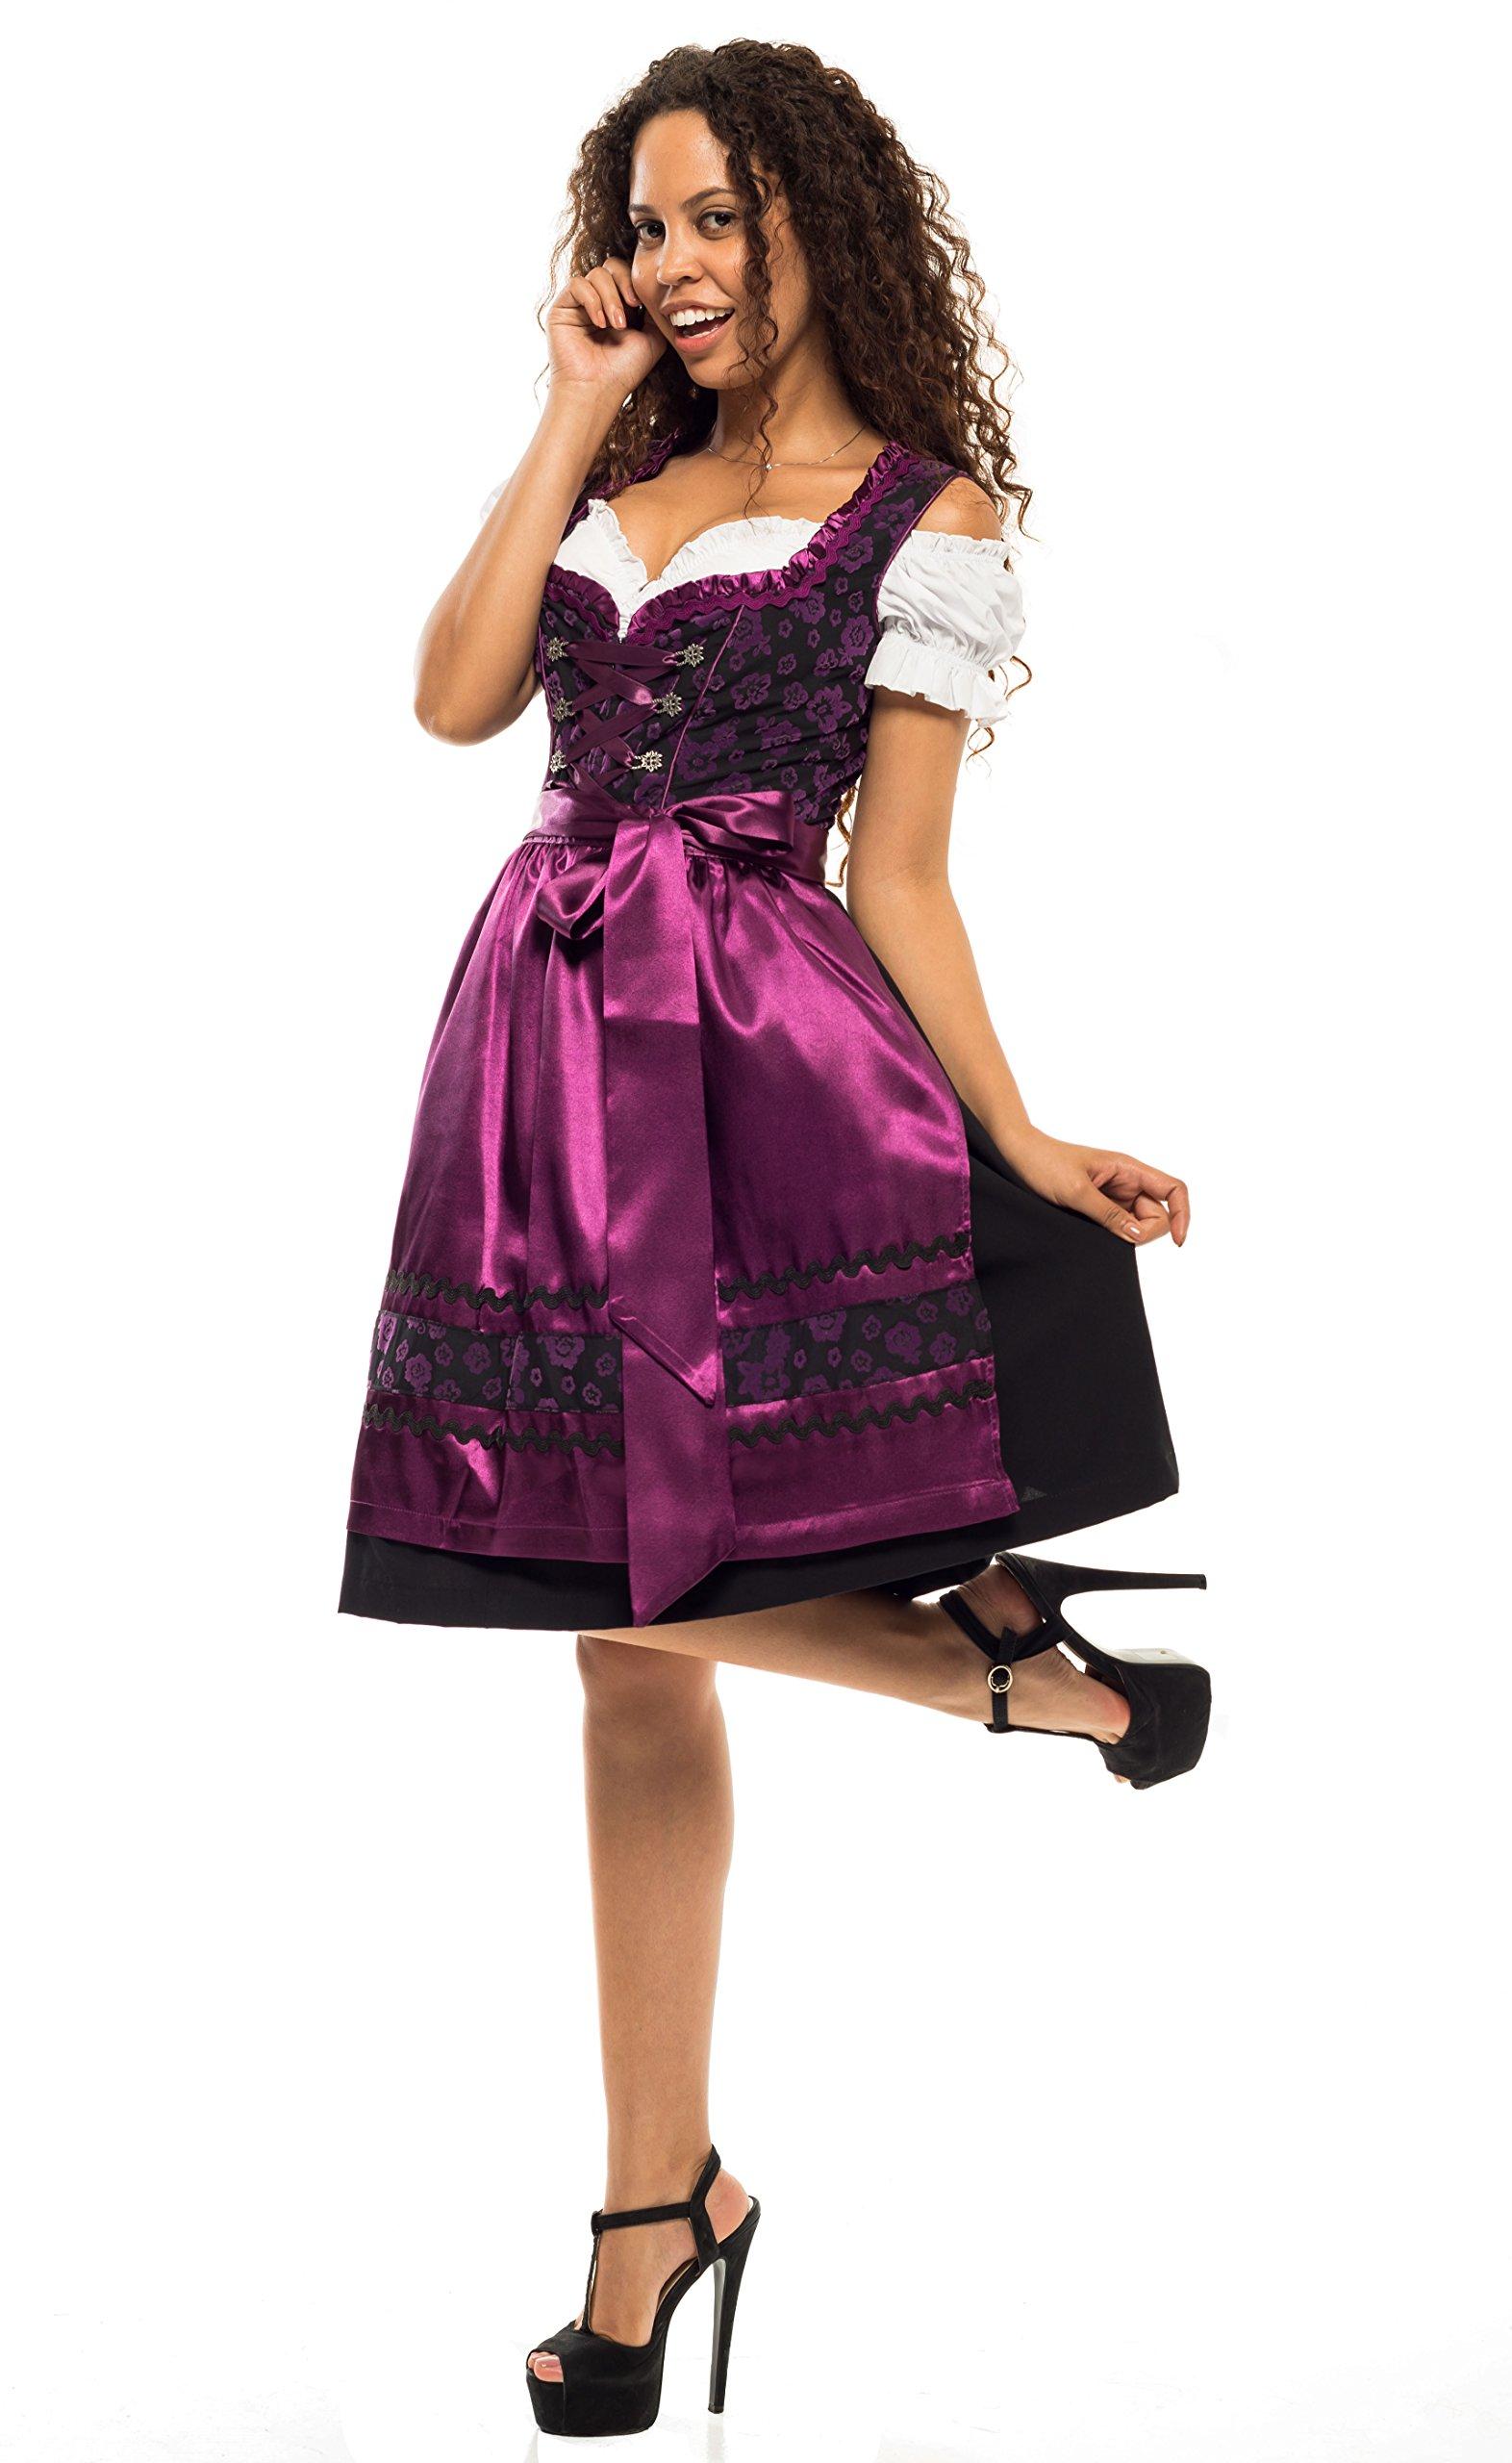 0527 Dirndl Germandress 3Tlg. Oktoberfest Gr.34 bis 52 !!ORIGINAL LIFOS!! (36)